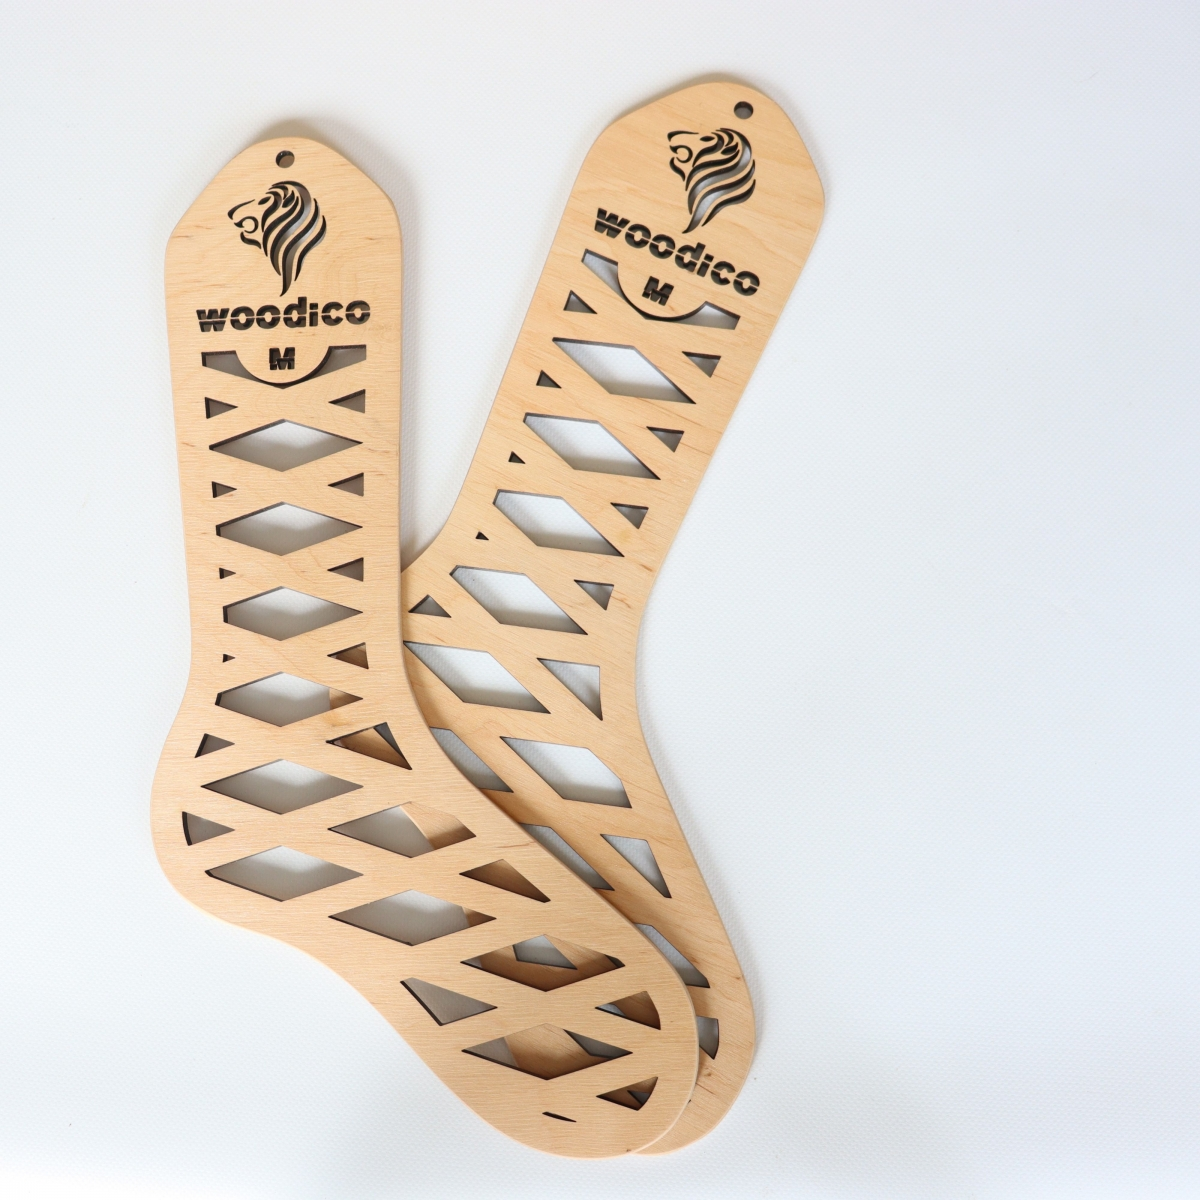 woodico.pro wooden sock blockers leo 19 1200x1200 - Wooden sock blockers / Leo